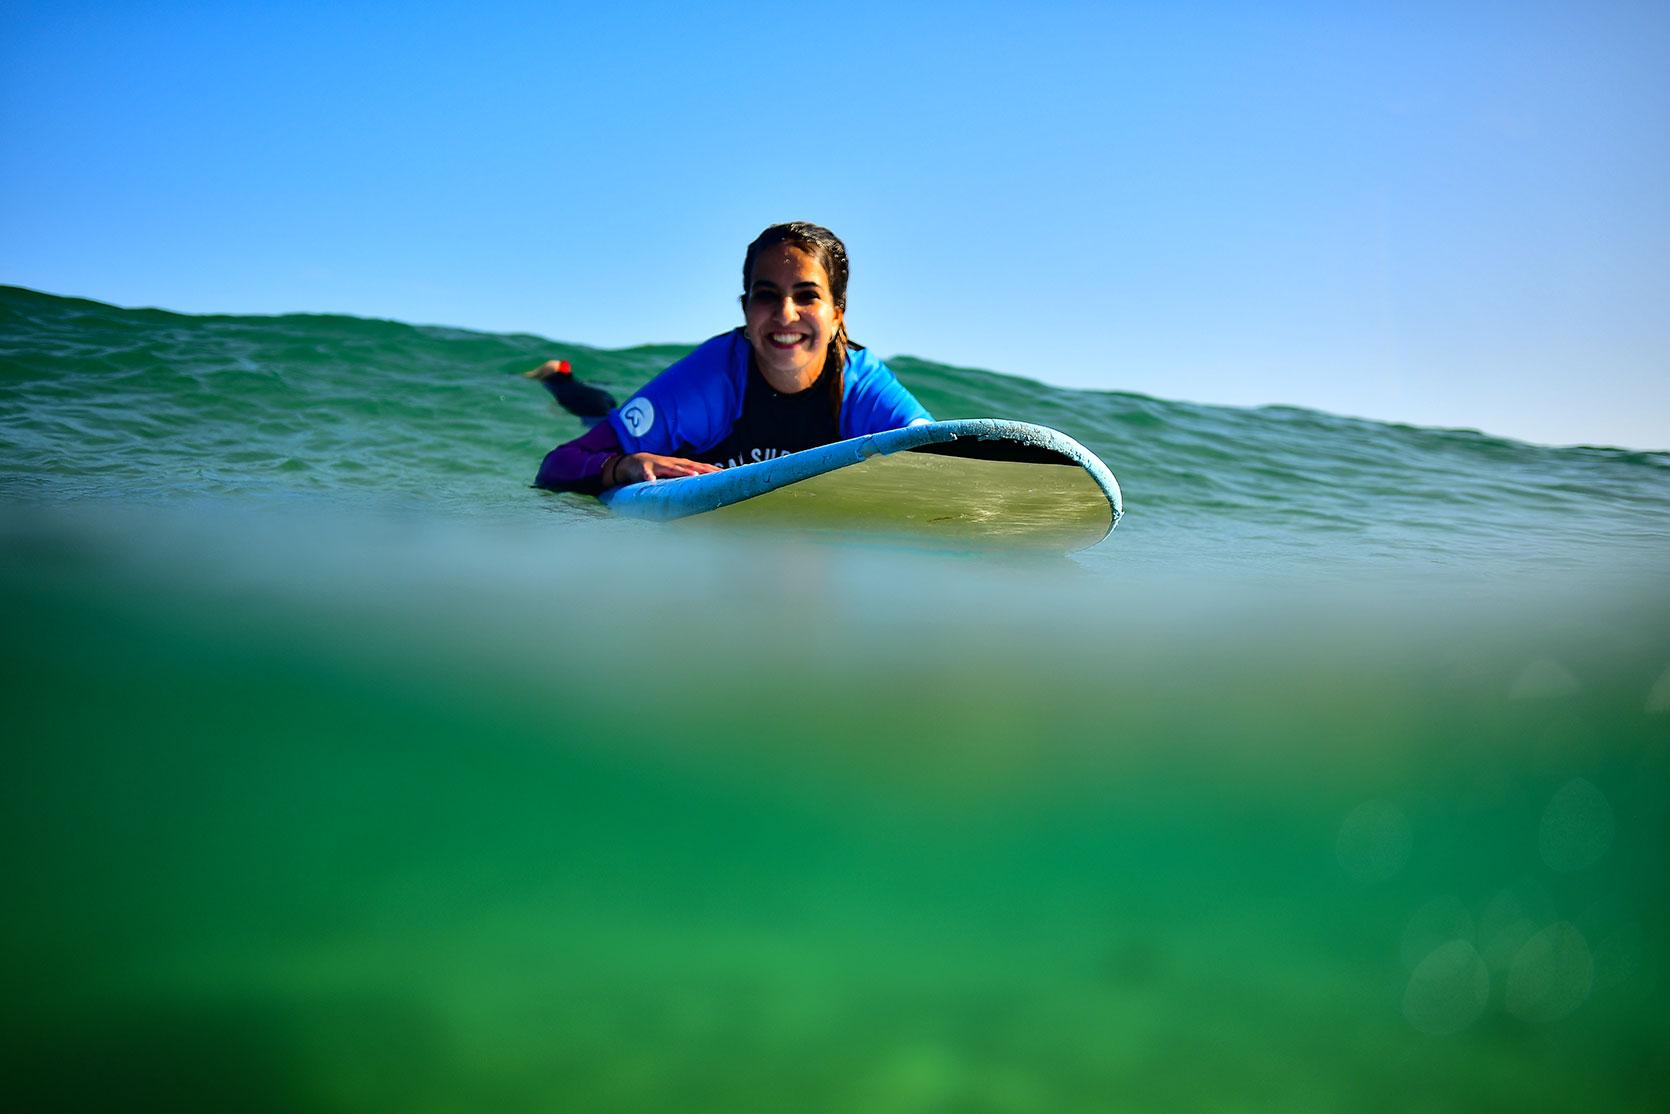 Campamentos de surf Semana Santa - Surf camps semana santa 2020